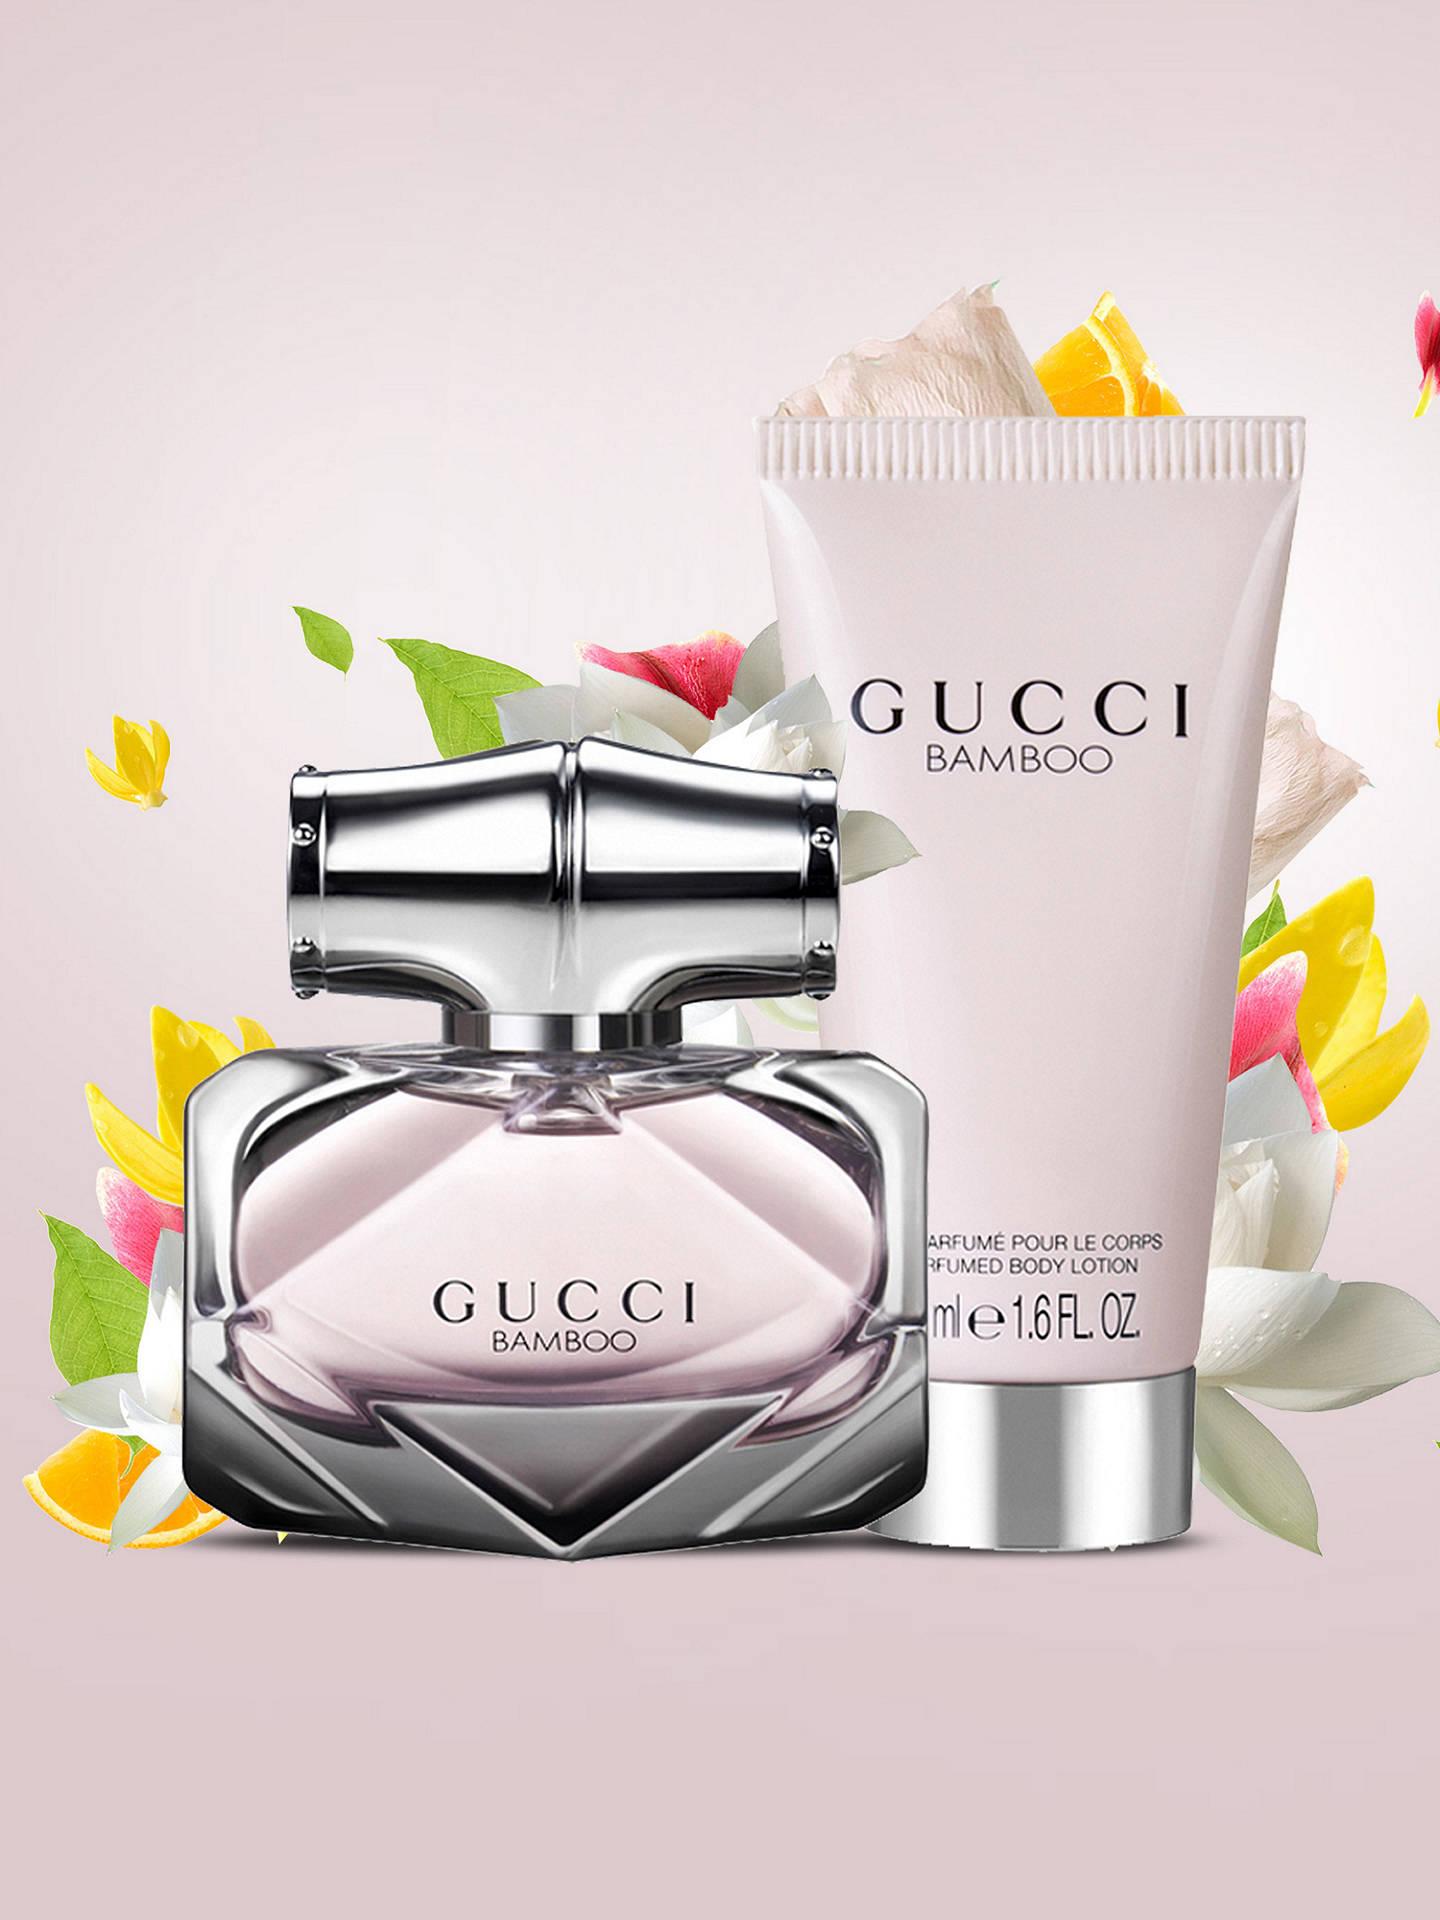 Gucci Bamboo 30ml Eau De Parfum For Her Fragrance Gift Set At John